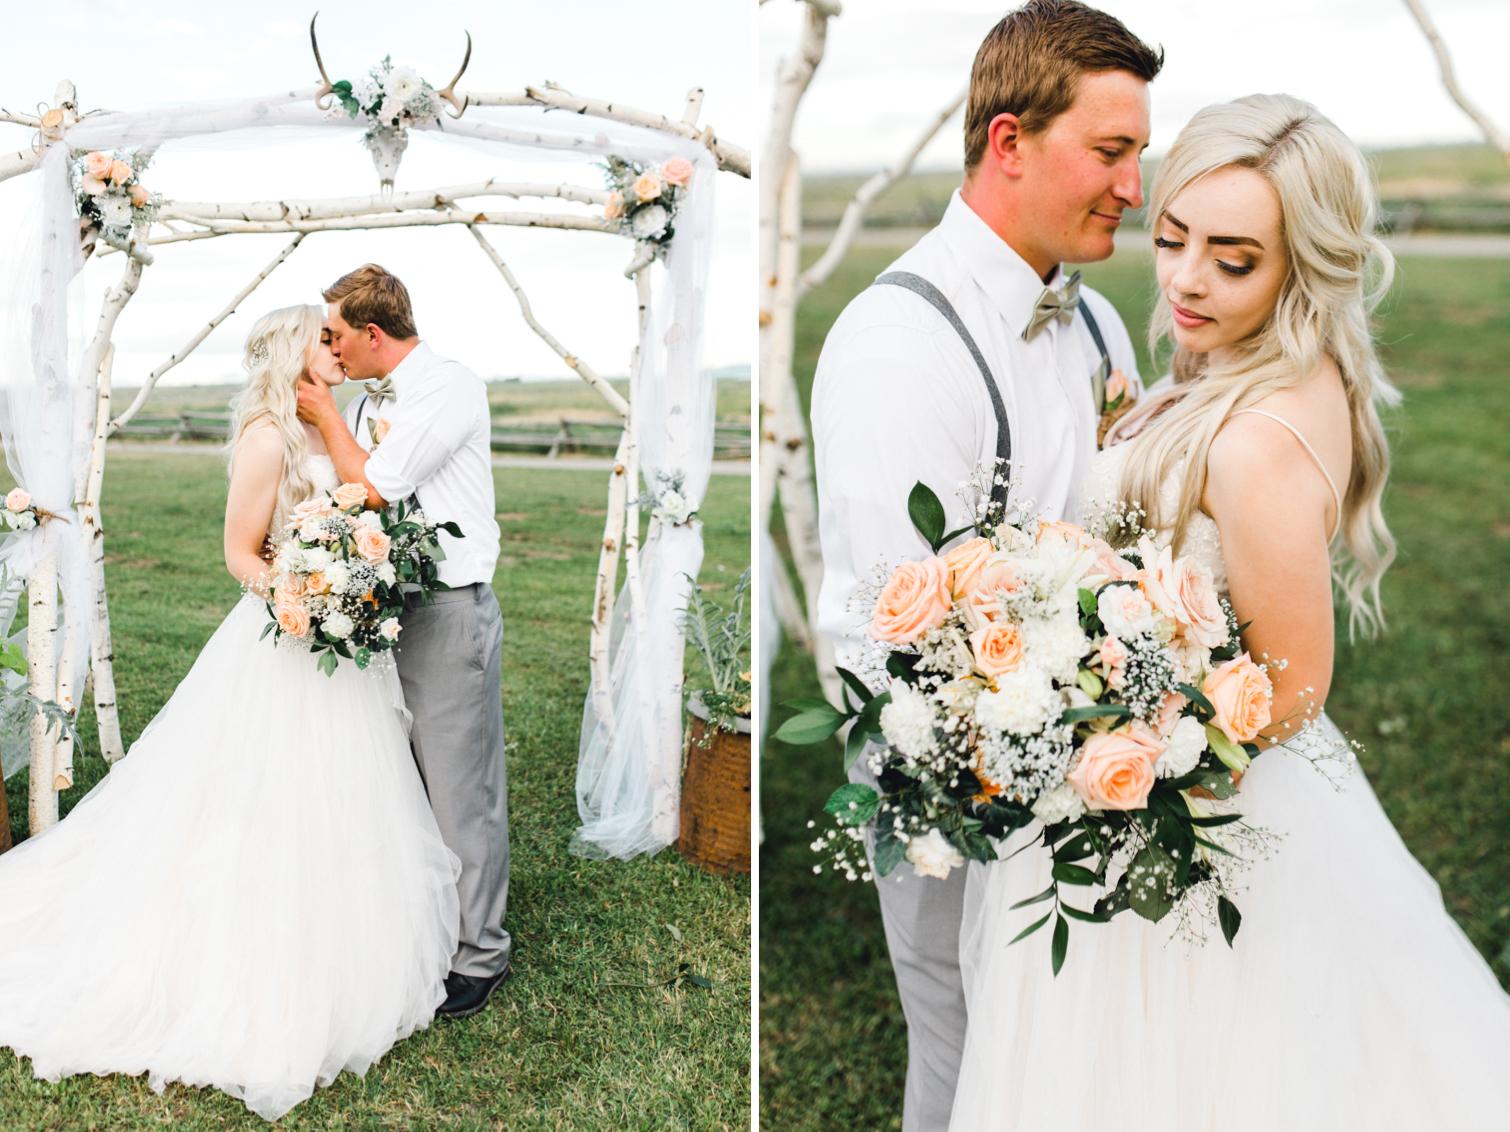 country-outdoor-rustic-wedding-tetons-idaho-anna-christine-photo-5.jpg